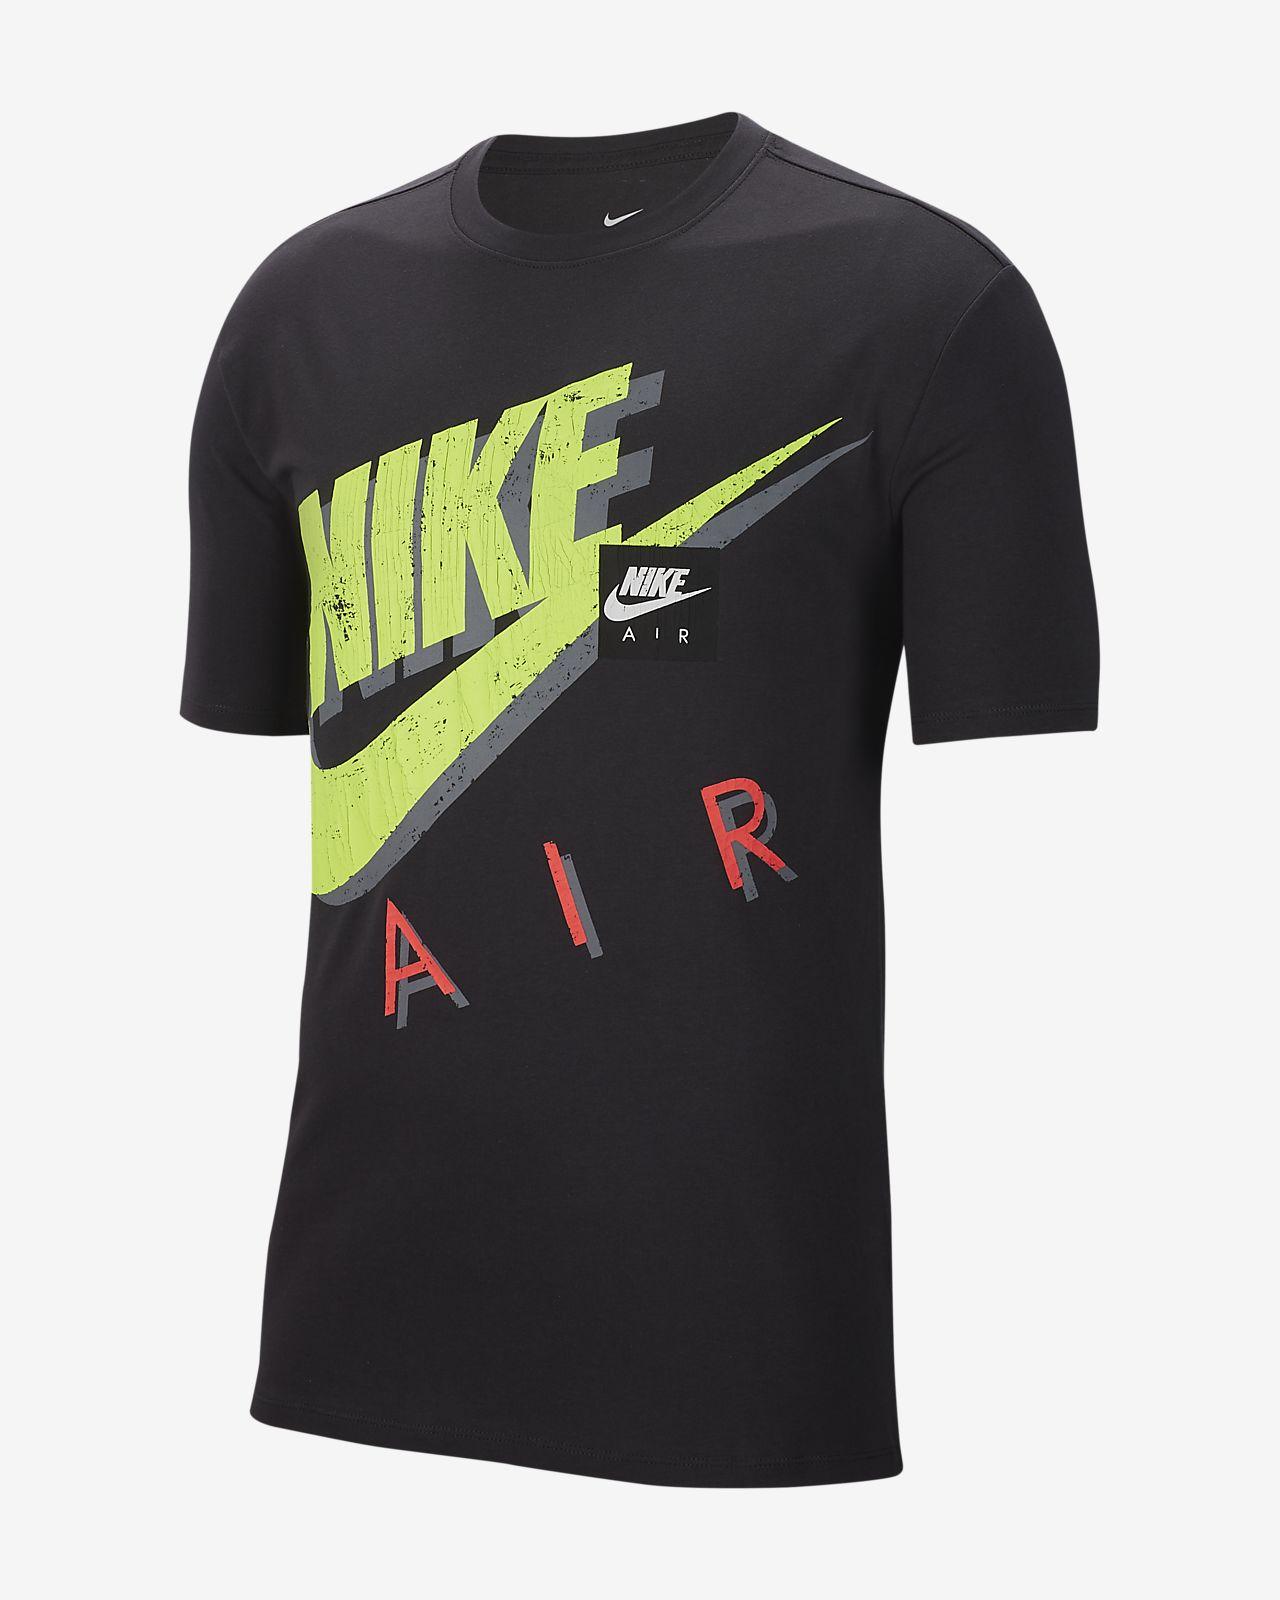 Nike Sportswear Herren-T-Shirt mit Print